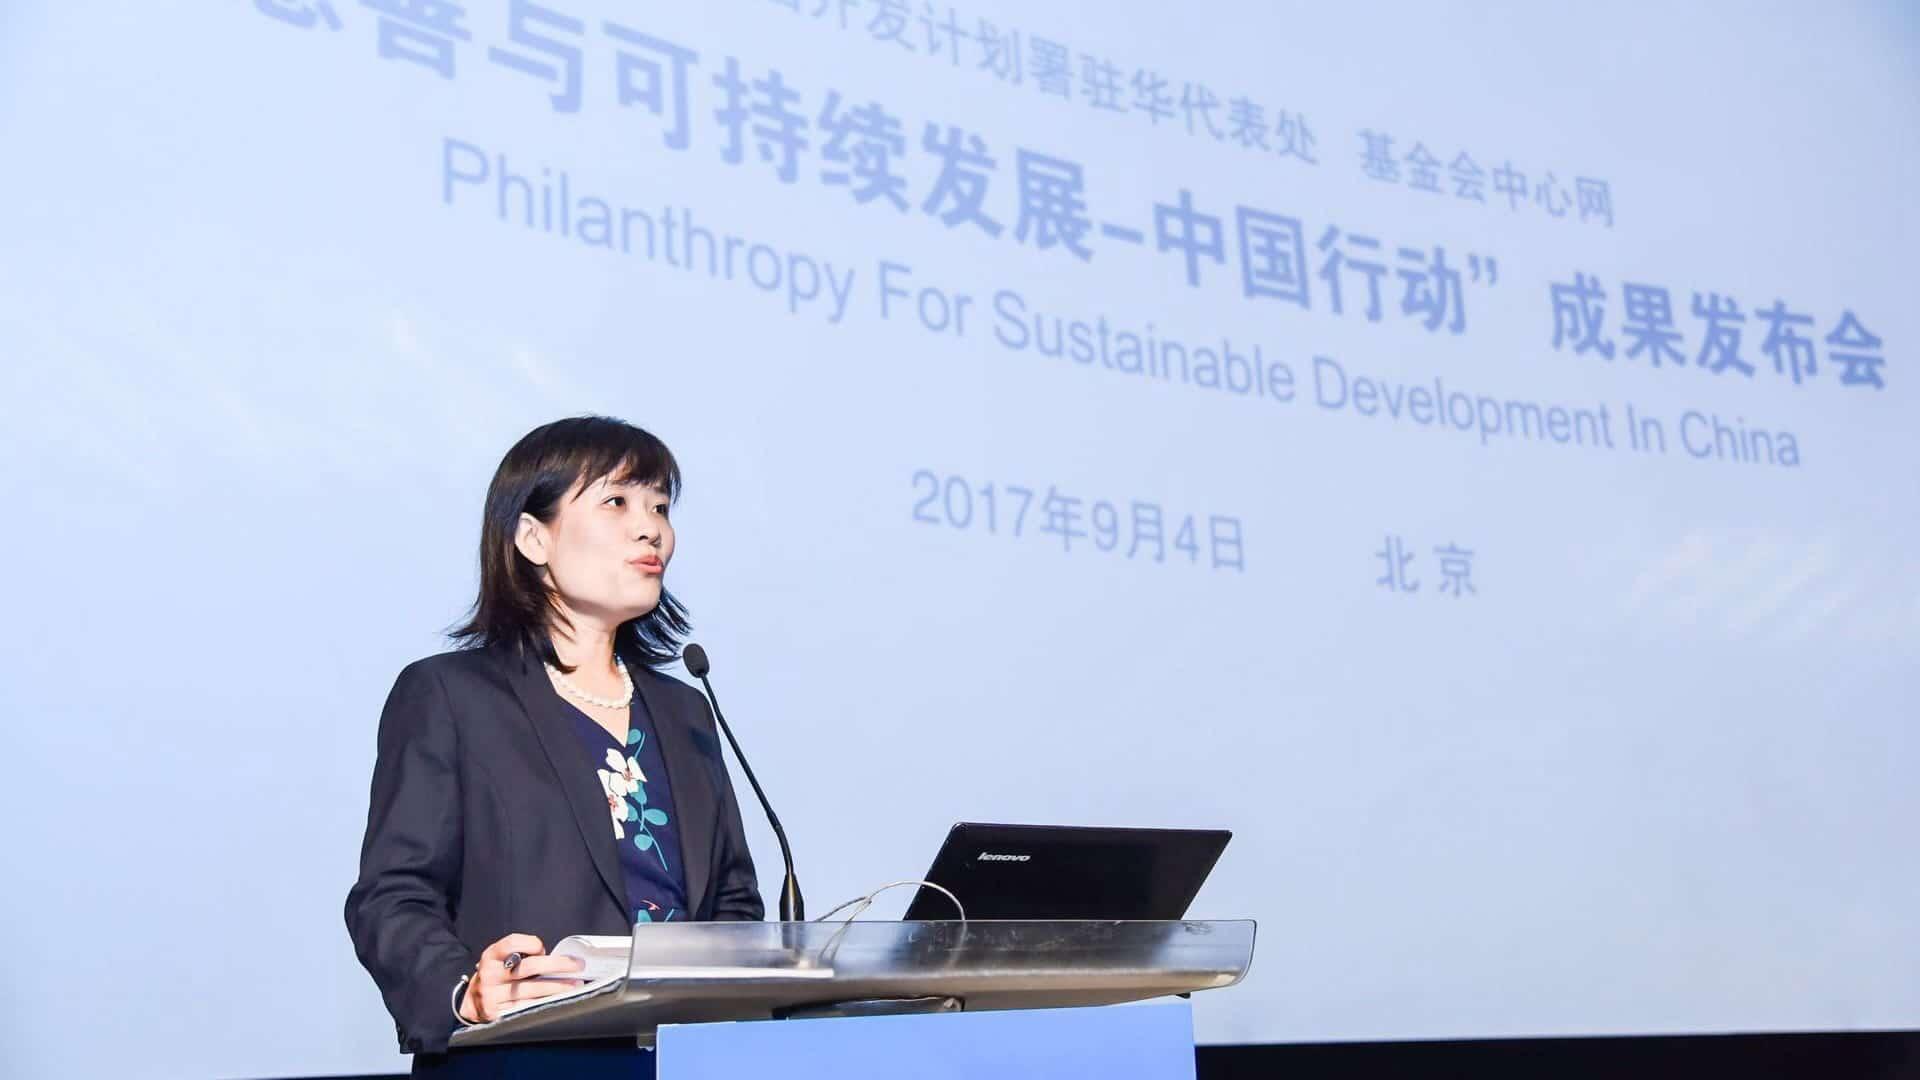 Gu Qing from UNDP